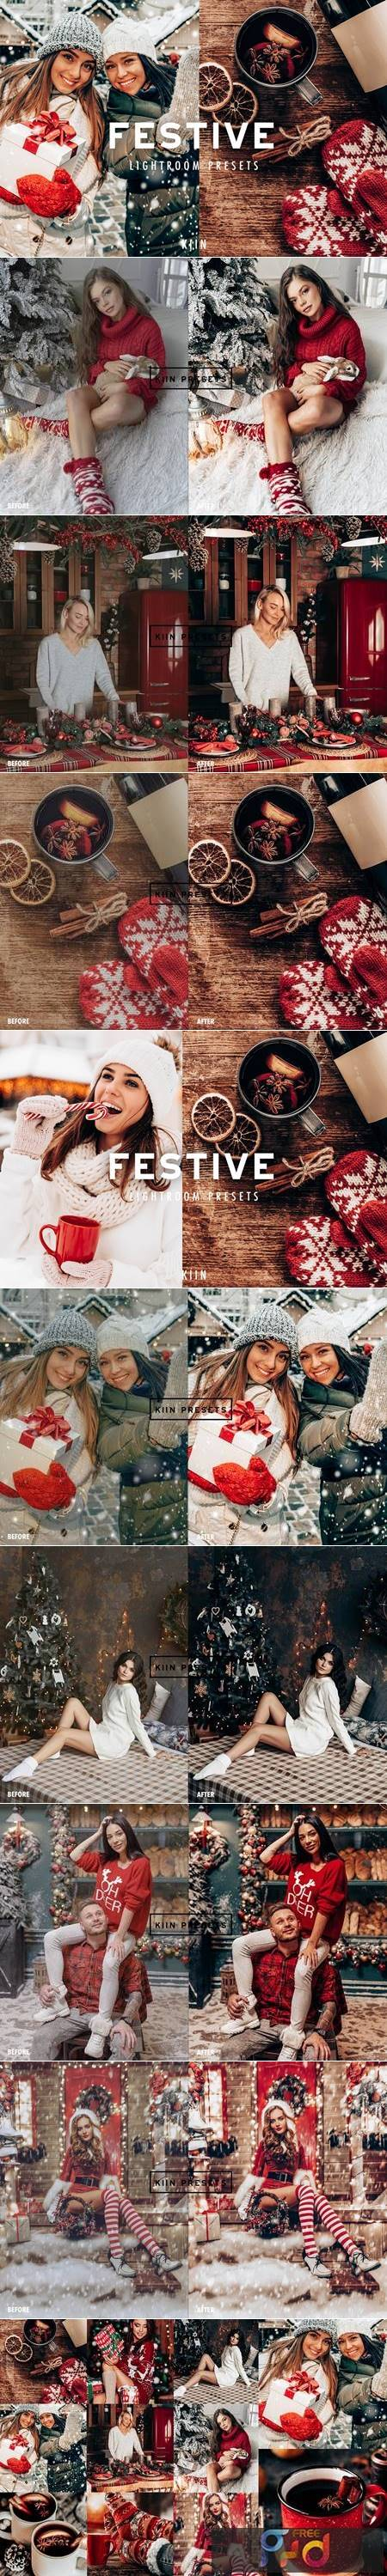 FESTIVE CHRISTMAS LIGHTROOM PRESETS 5634917 1